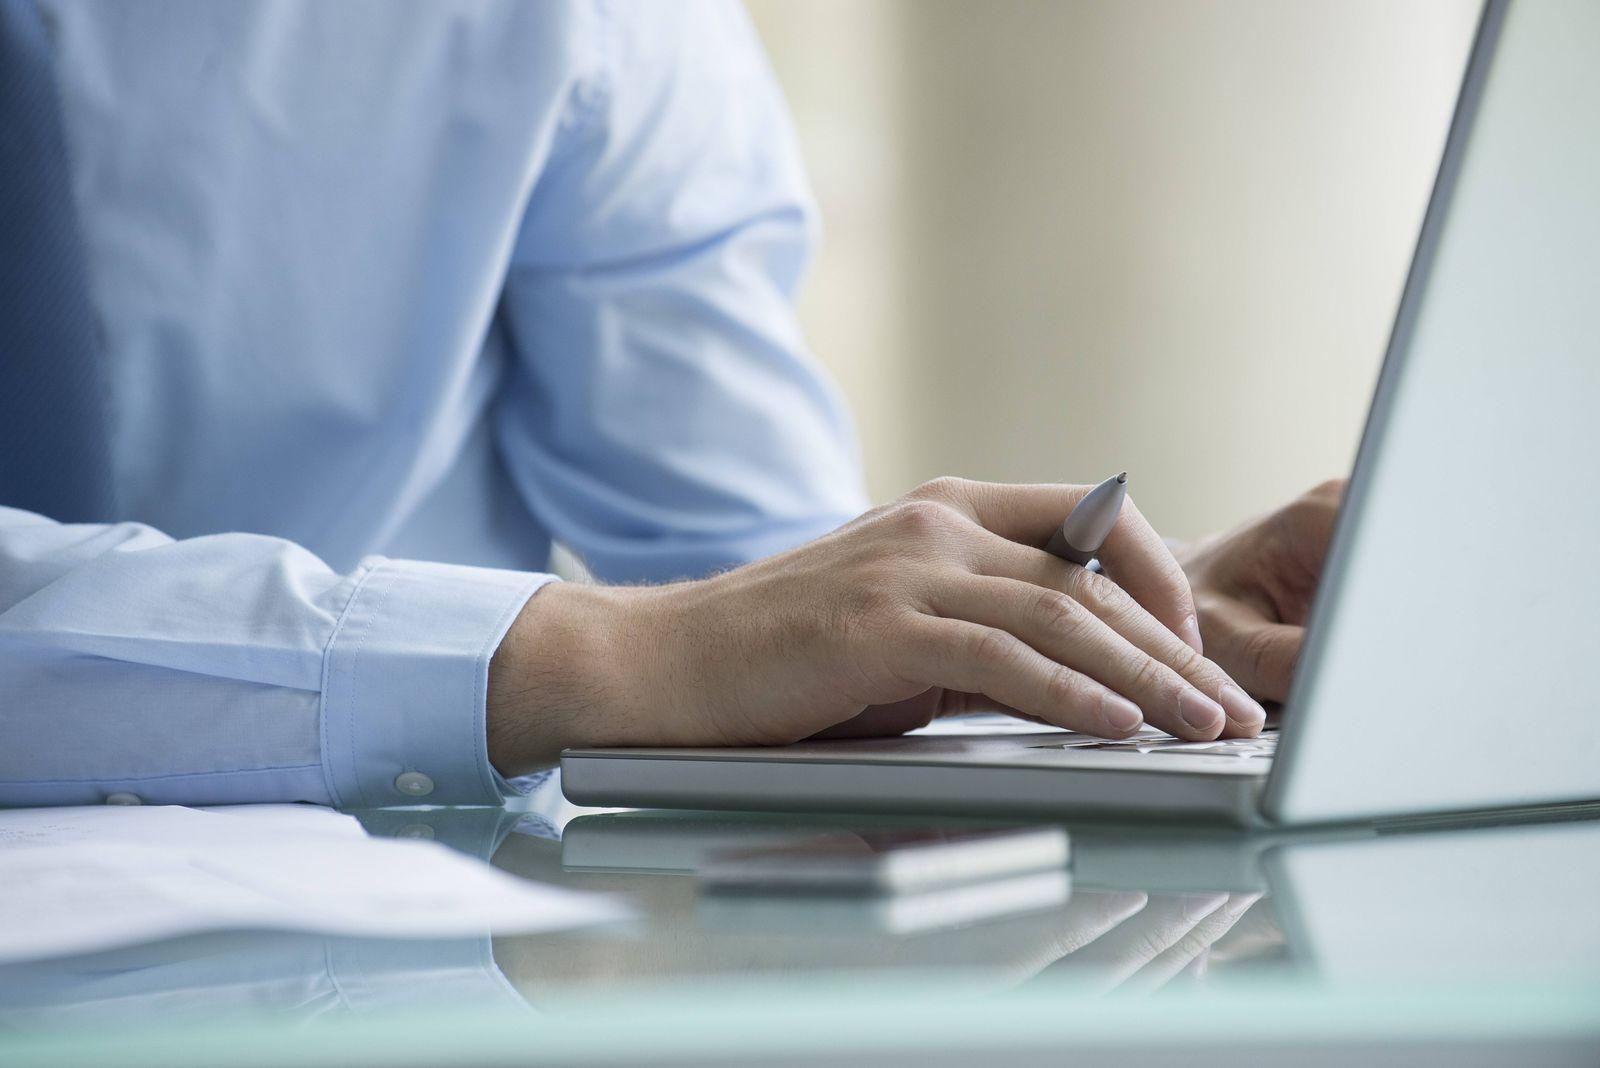 Man using laptop computer PUBLICATIONxINxGERxSUIxAUTxONLY Copyright EricxAudras B39072224